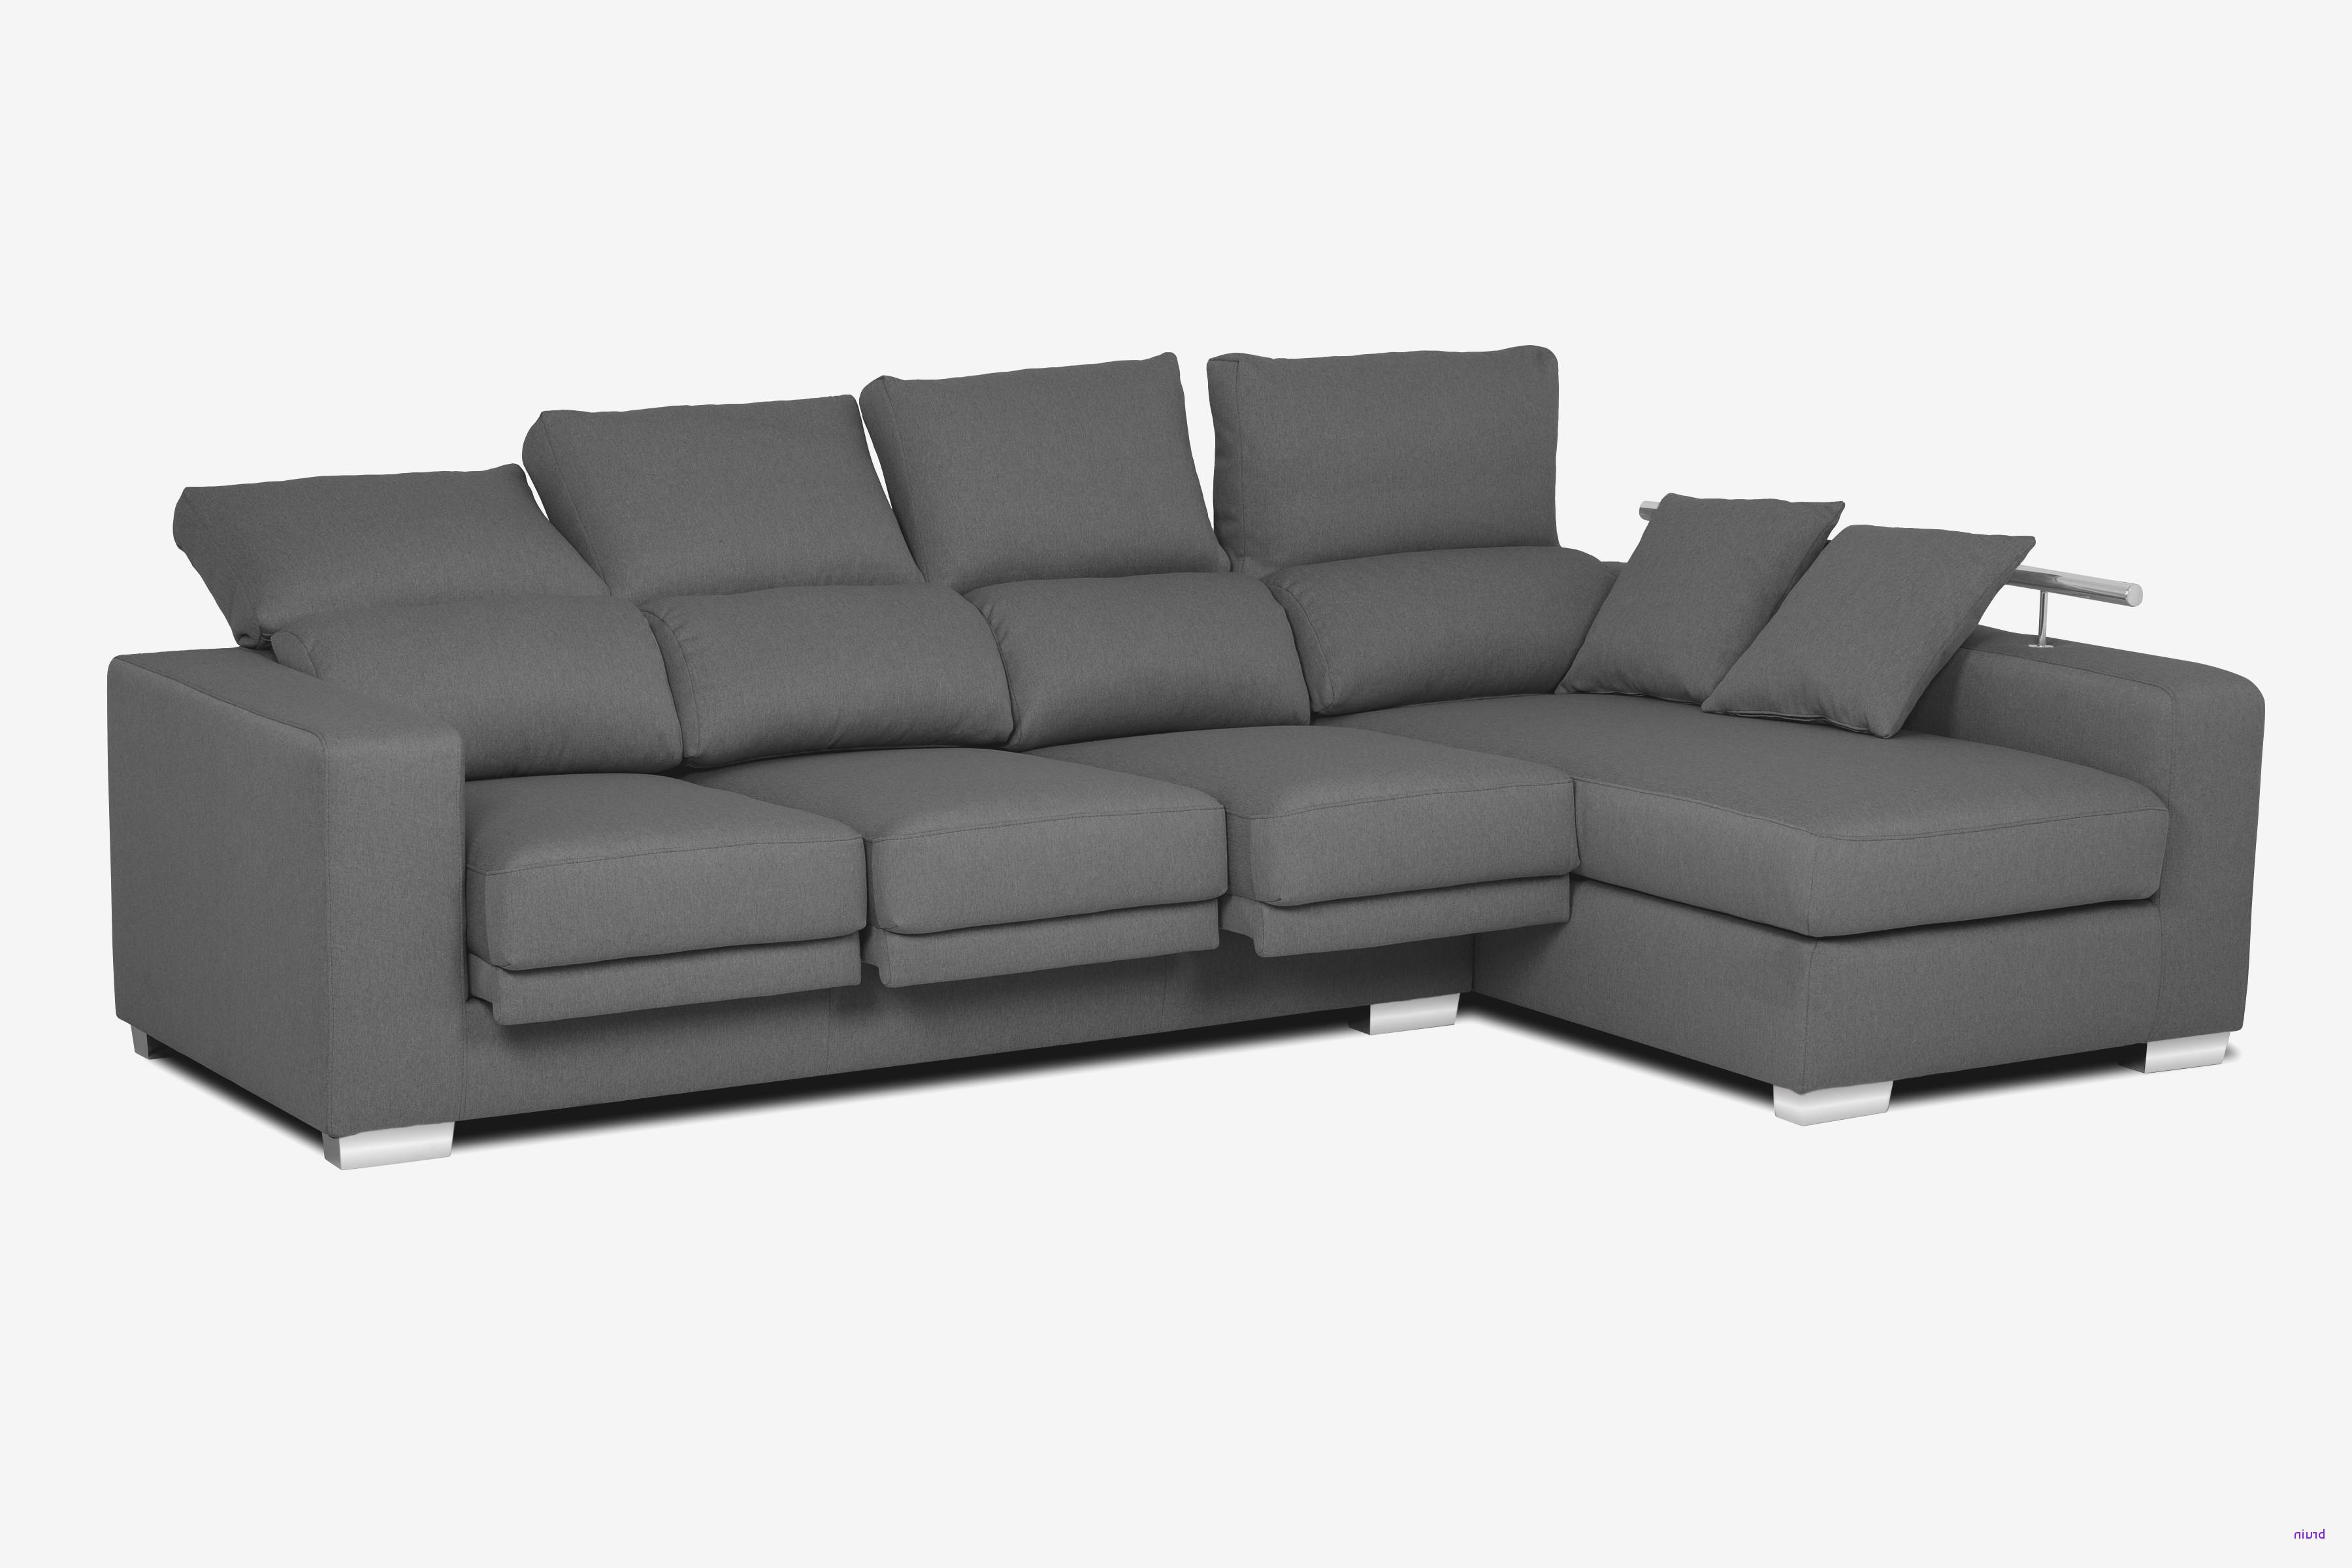 Conforama sofas Cheslong J7do Belle Chaise Longue Conforama à 25 Inspirador sofa Cama Conforama